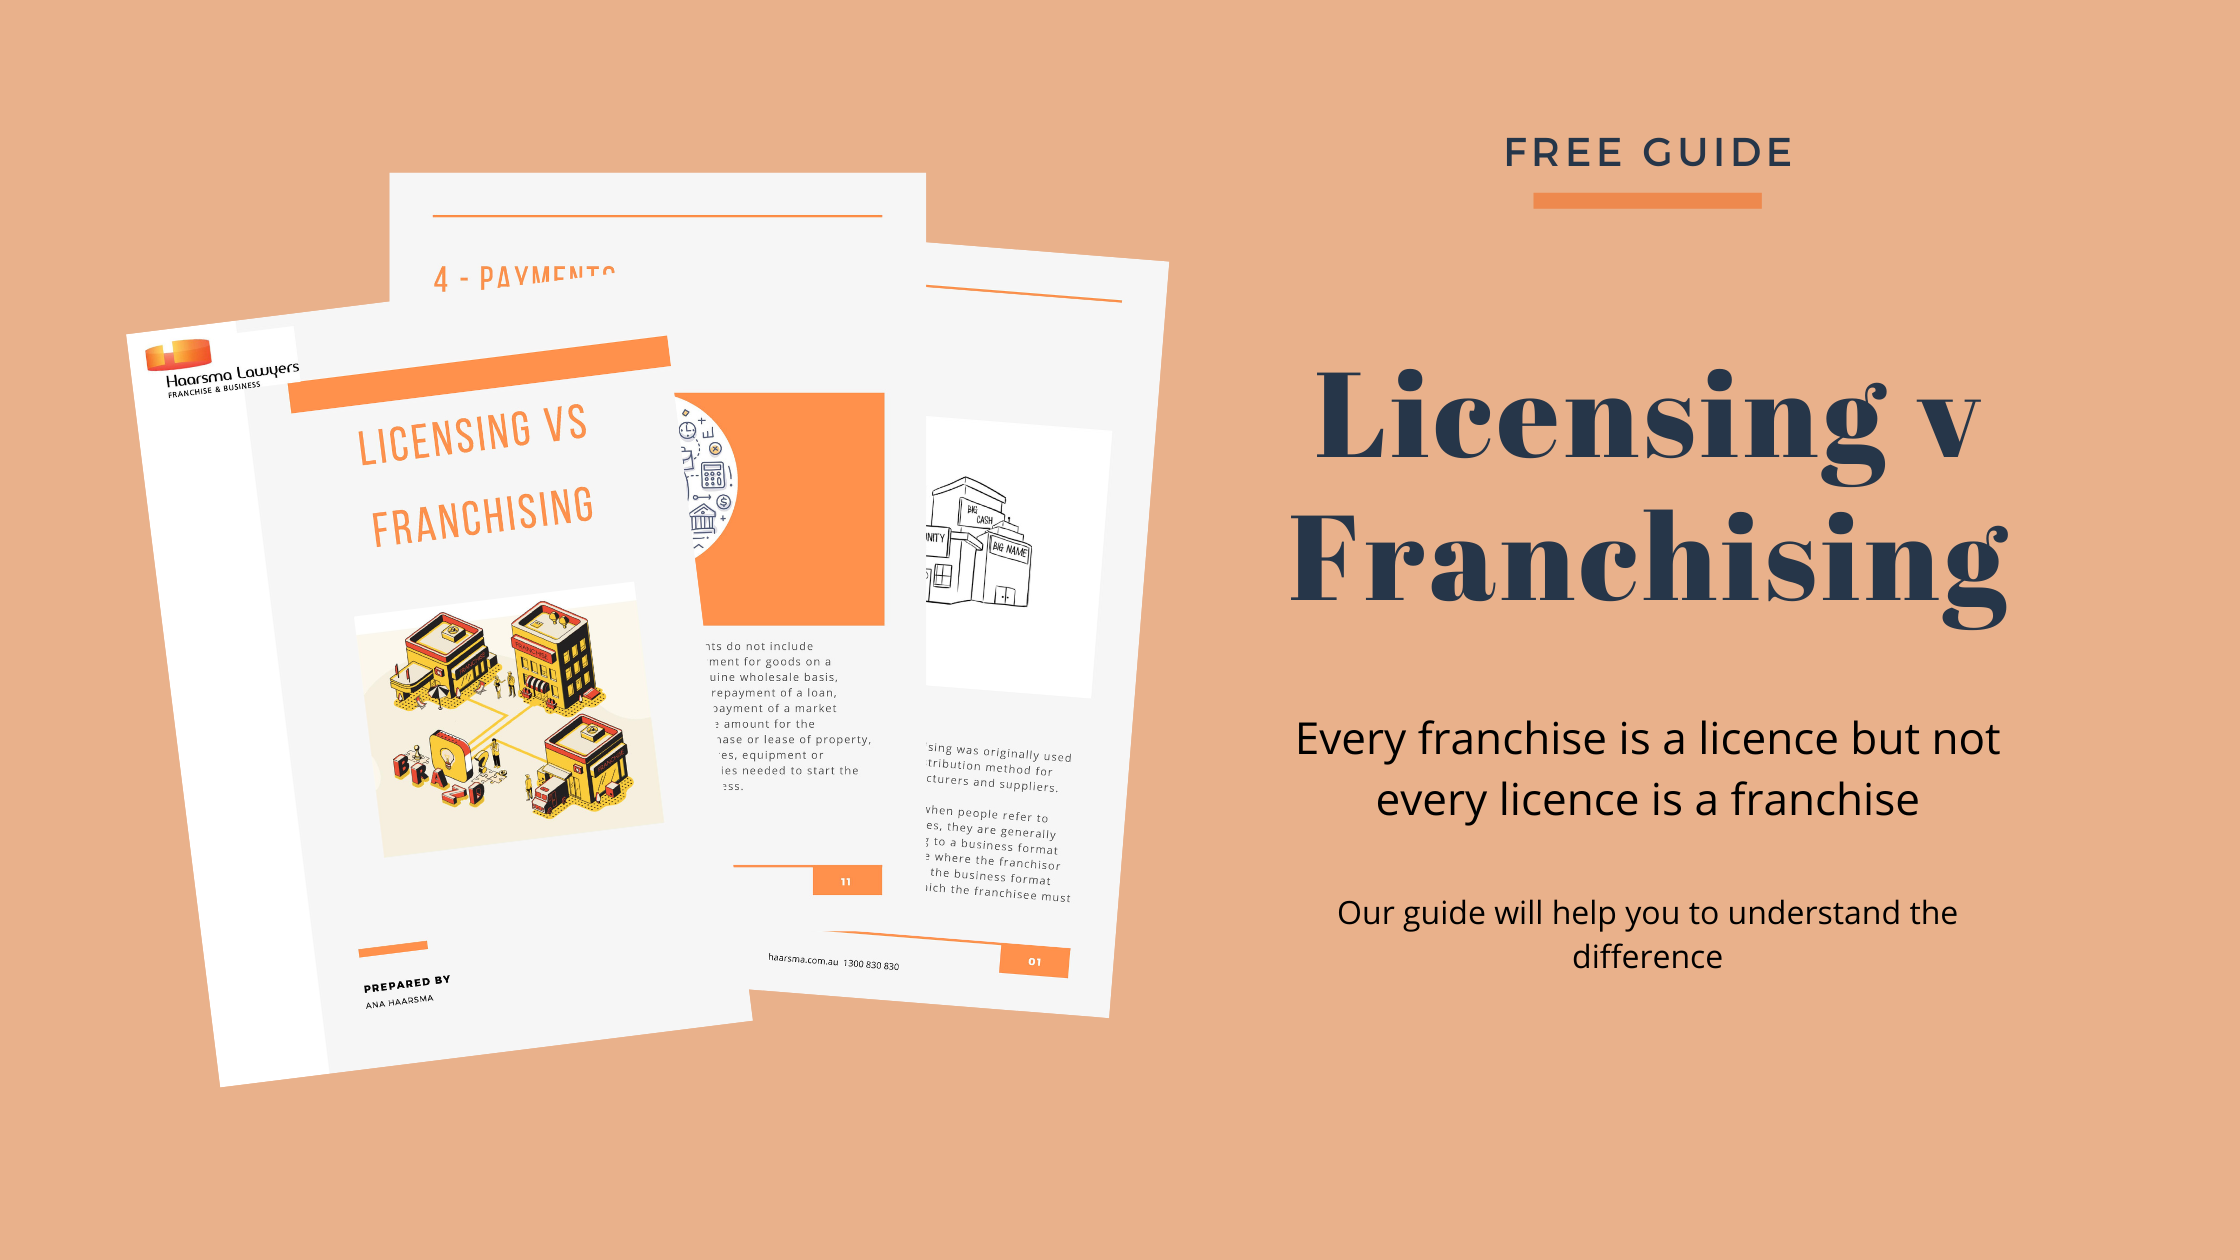 Licensing v Franchising